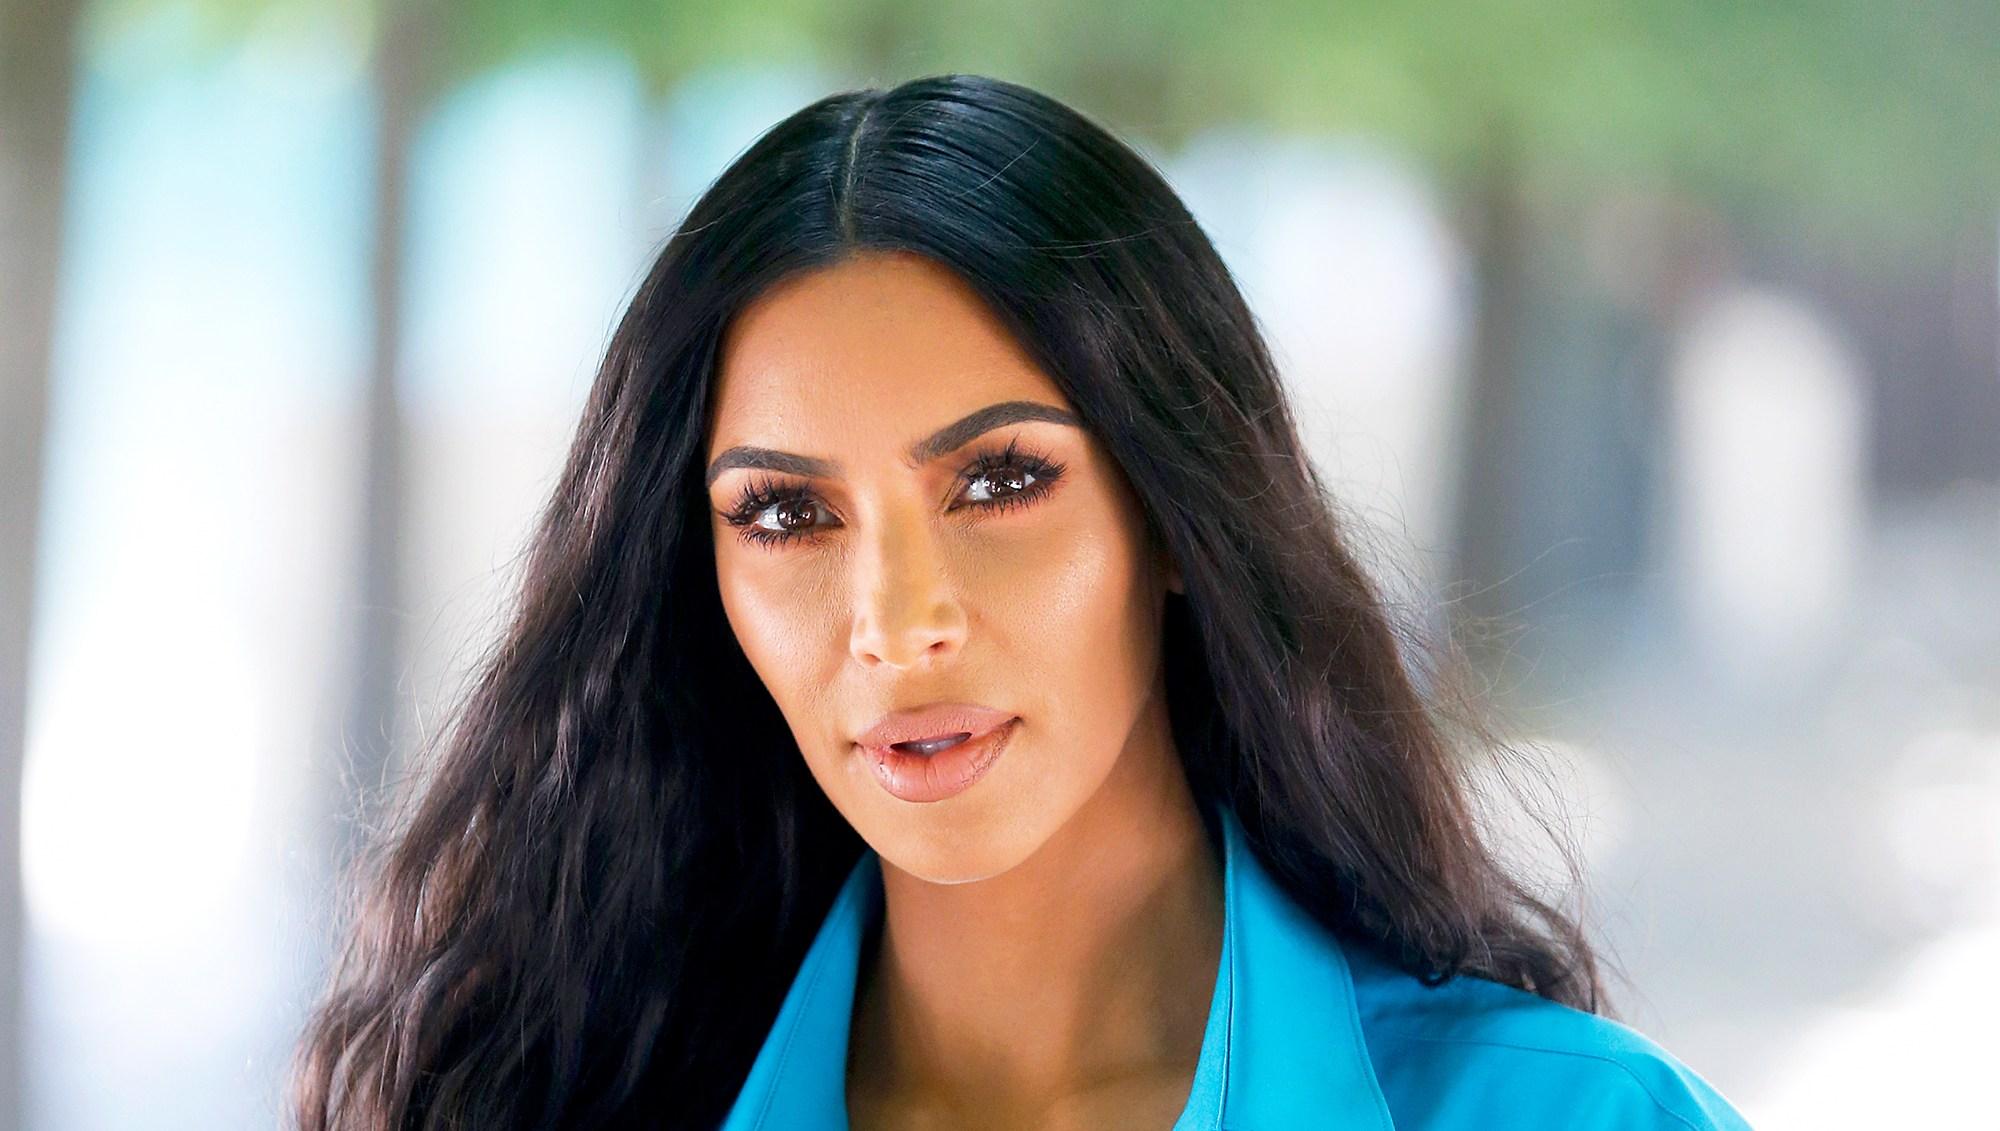 Kim Kardashian attends the Louis Vuitton Menswear Spring/Summer 2019 show as part of Paris Fashion Week Week in Paris, France.